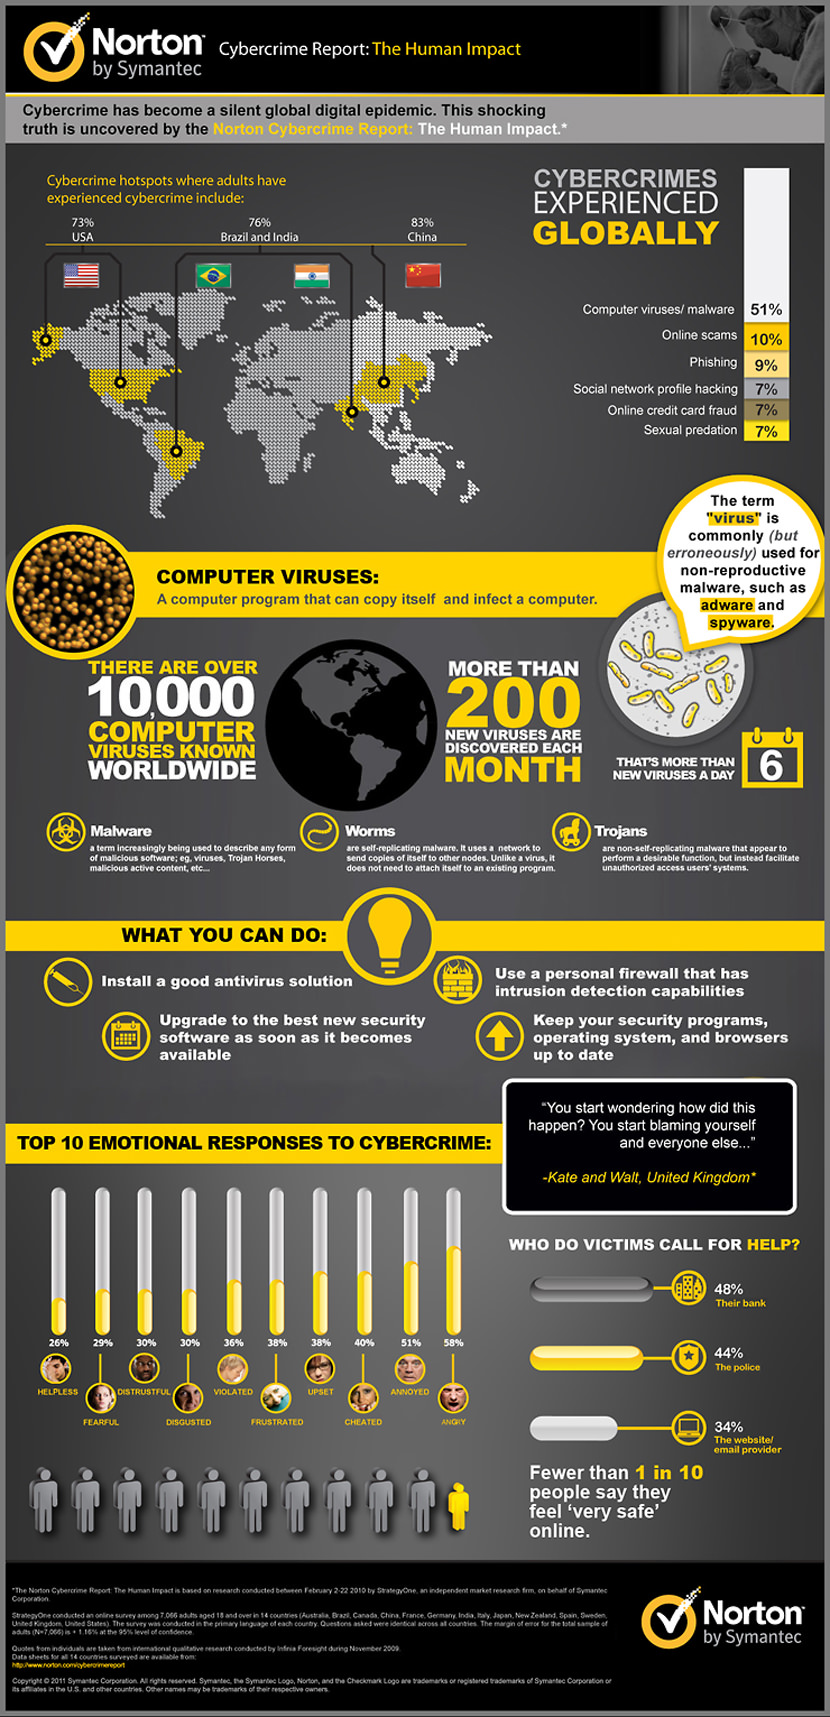 norton cybercrime infographic